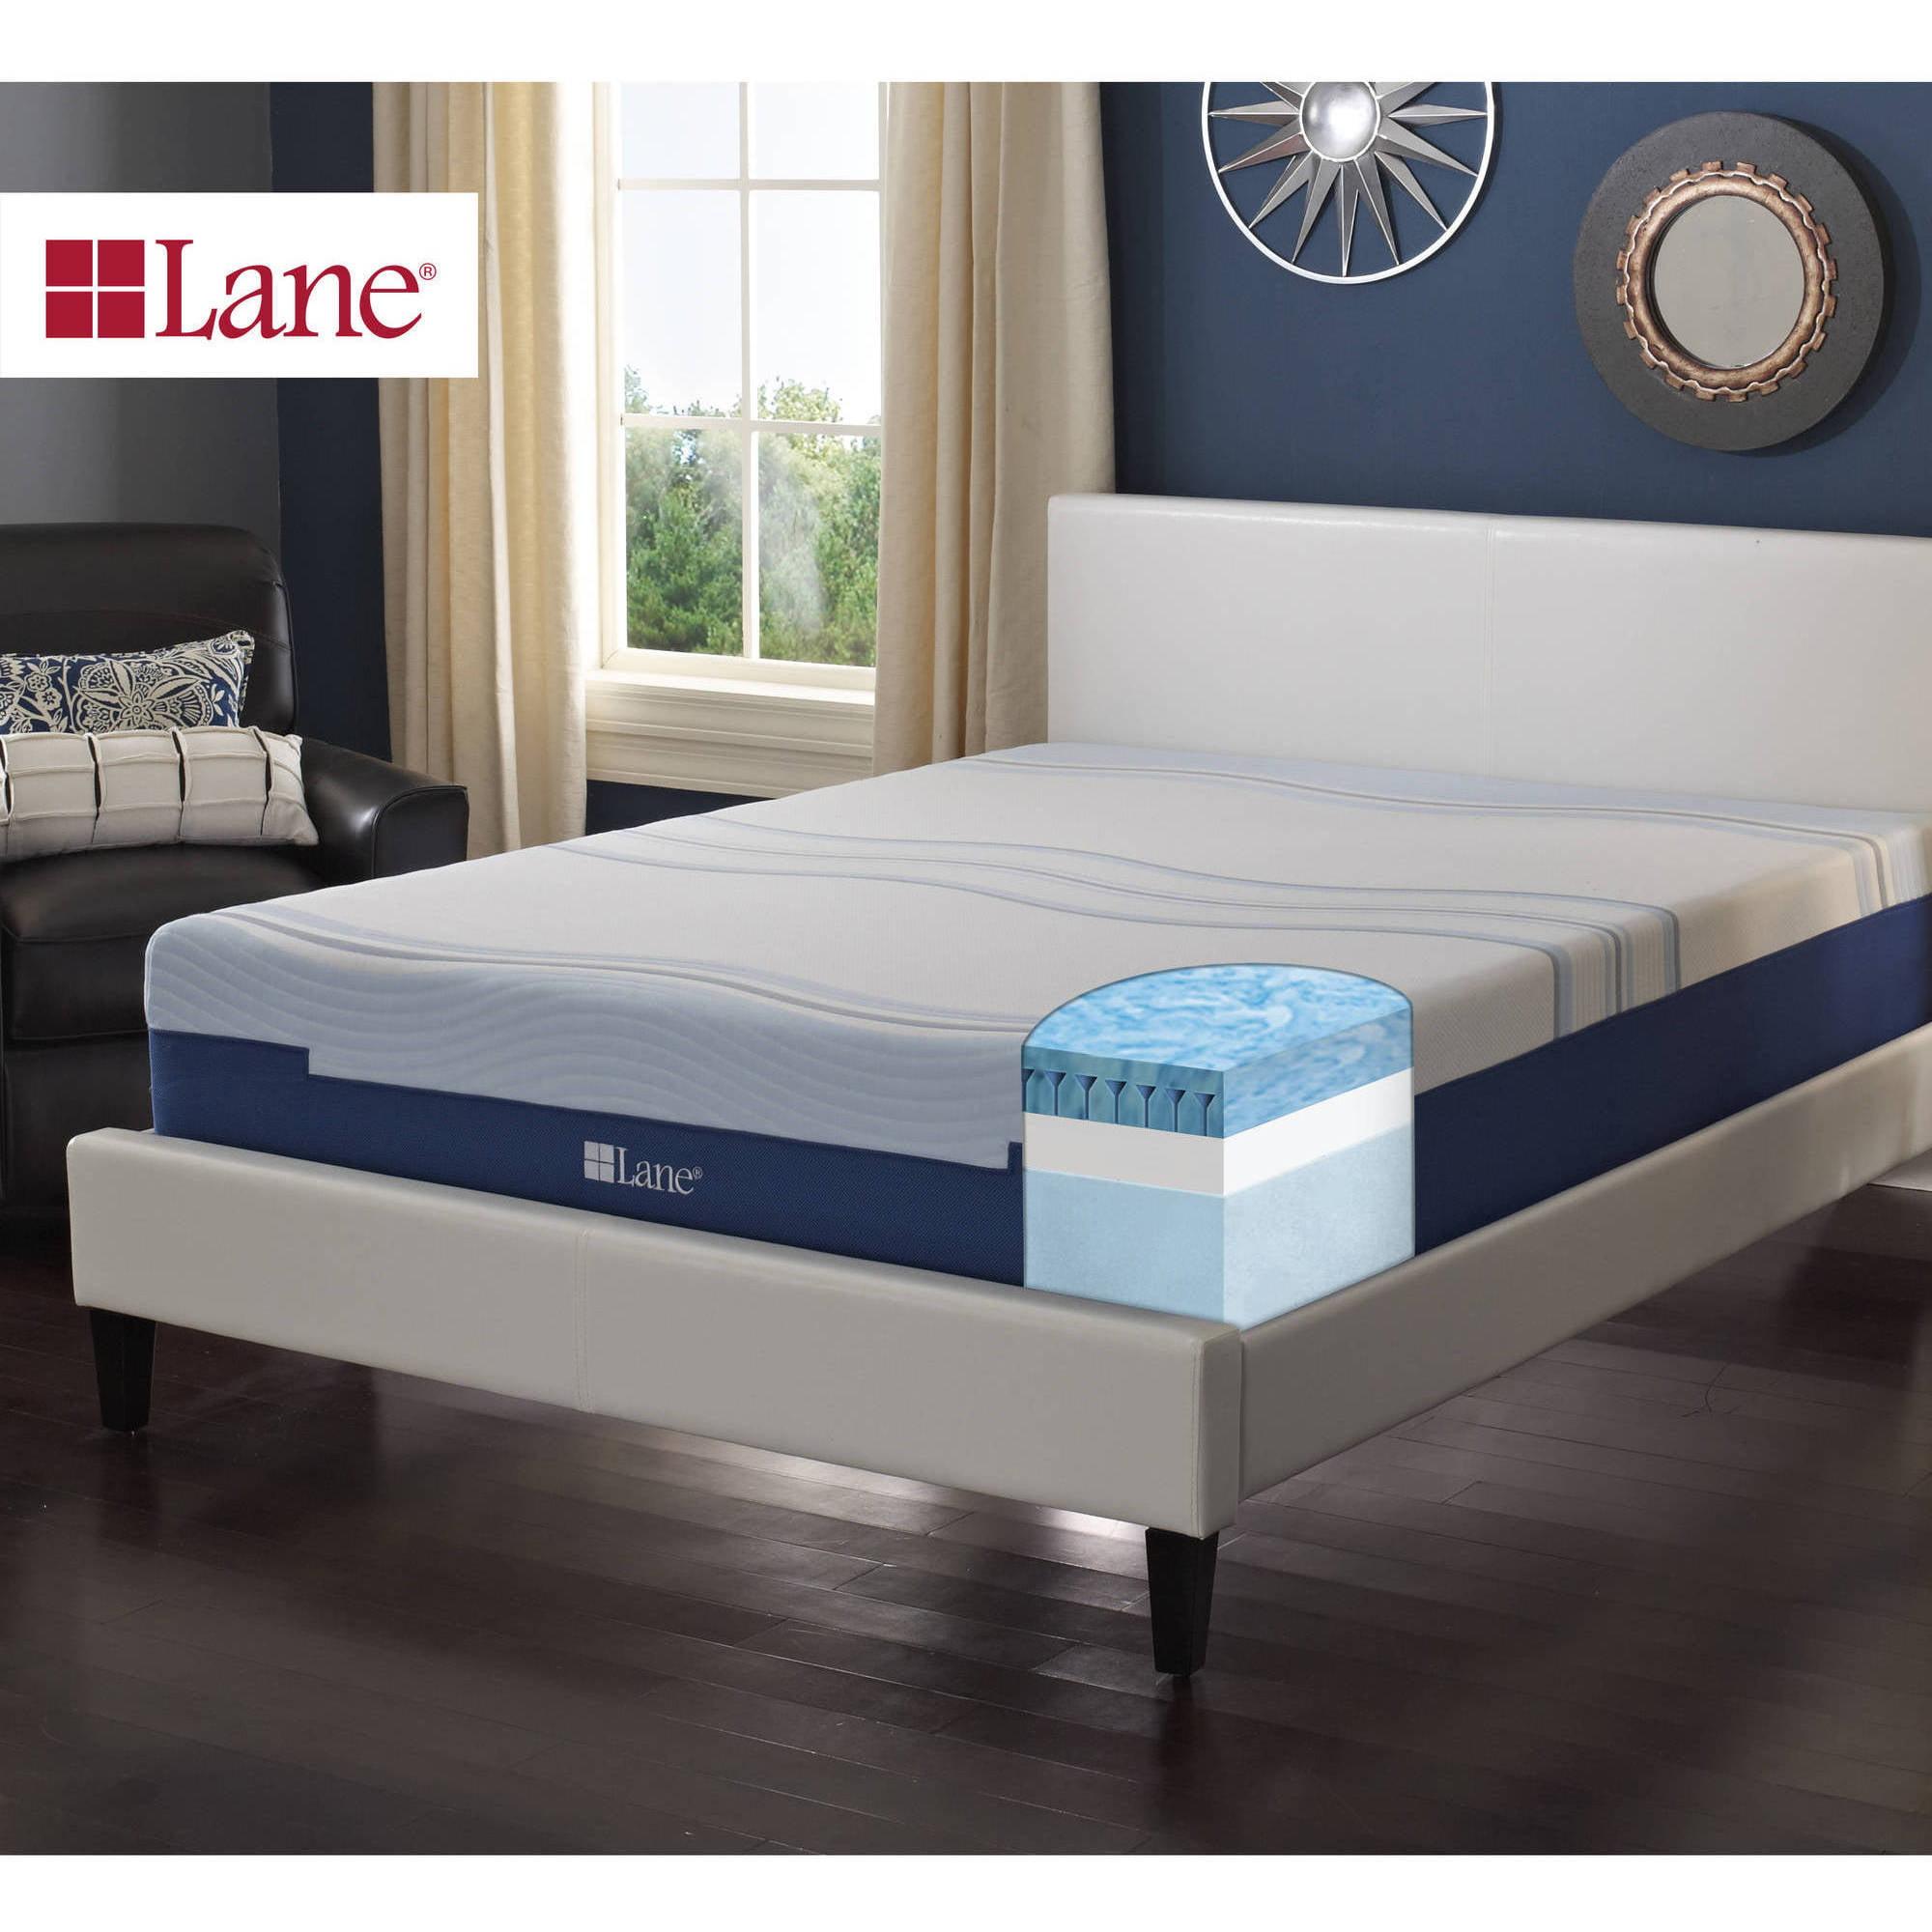 "Contura by Lane 10"" Medium Fim Gellux Fusion Engineered Latex Foam Mattress Bed"